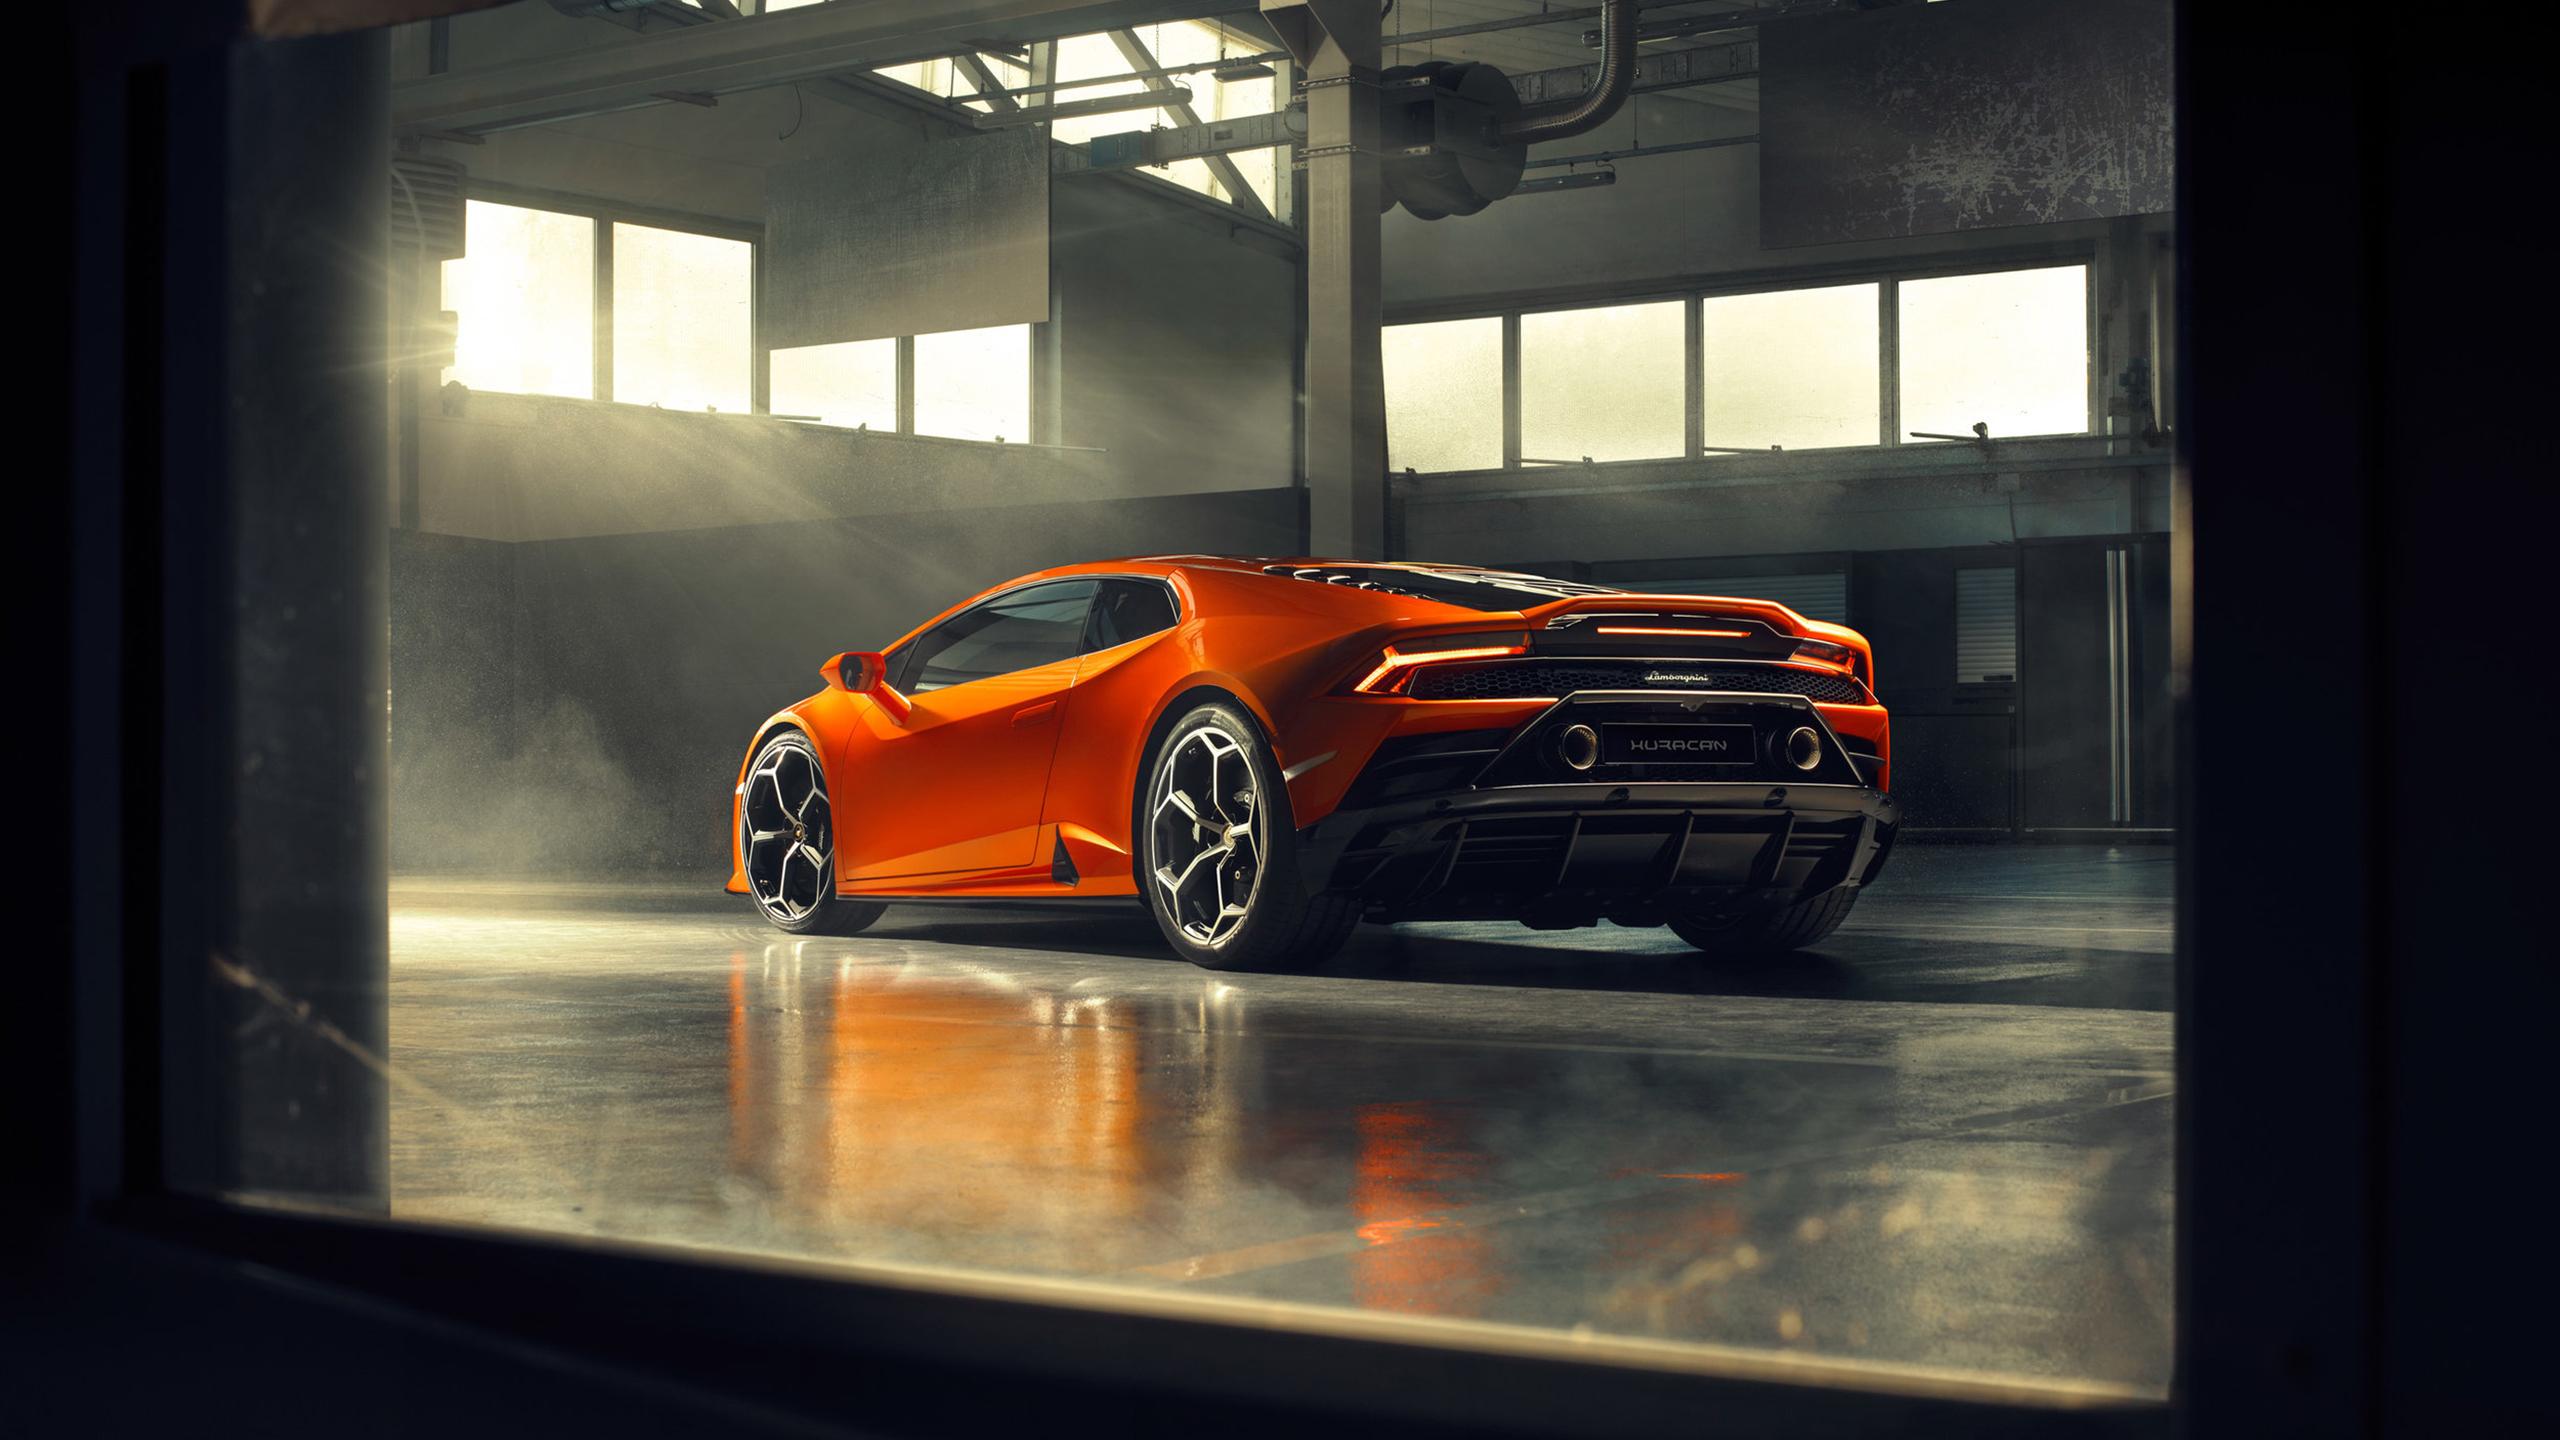 Lamborghini Huracan EVO 2019 4K 2 Wallpaper | HD Car Wallpapers | ID #11878